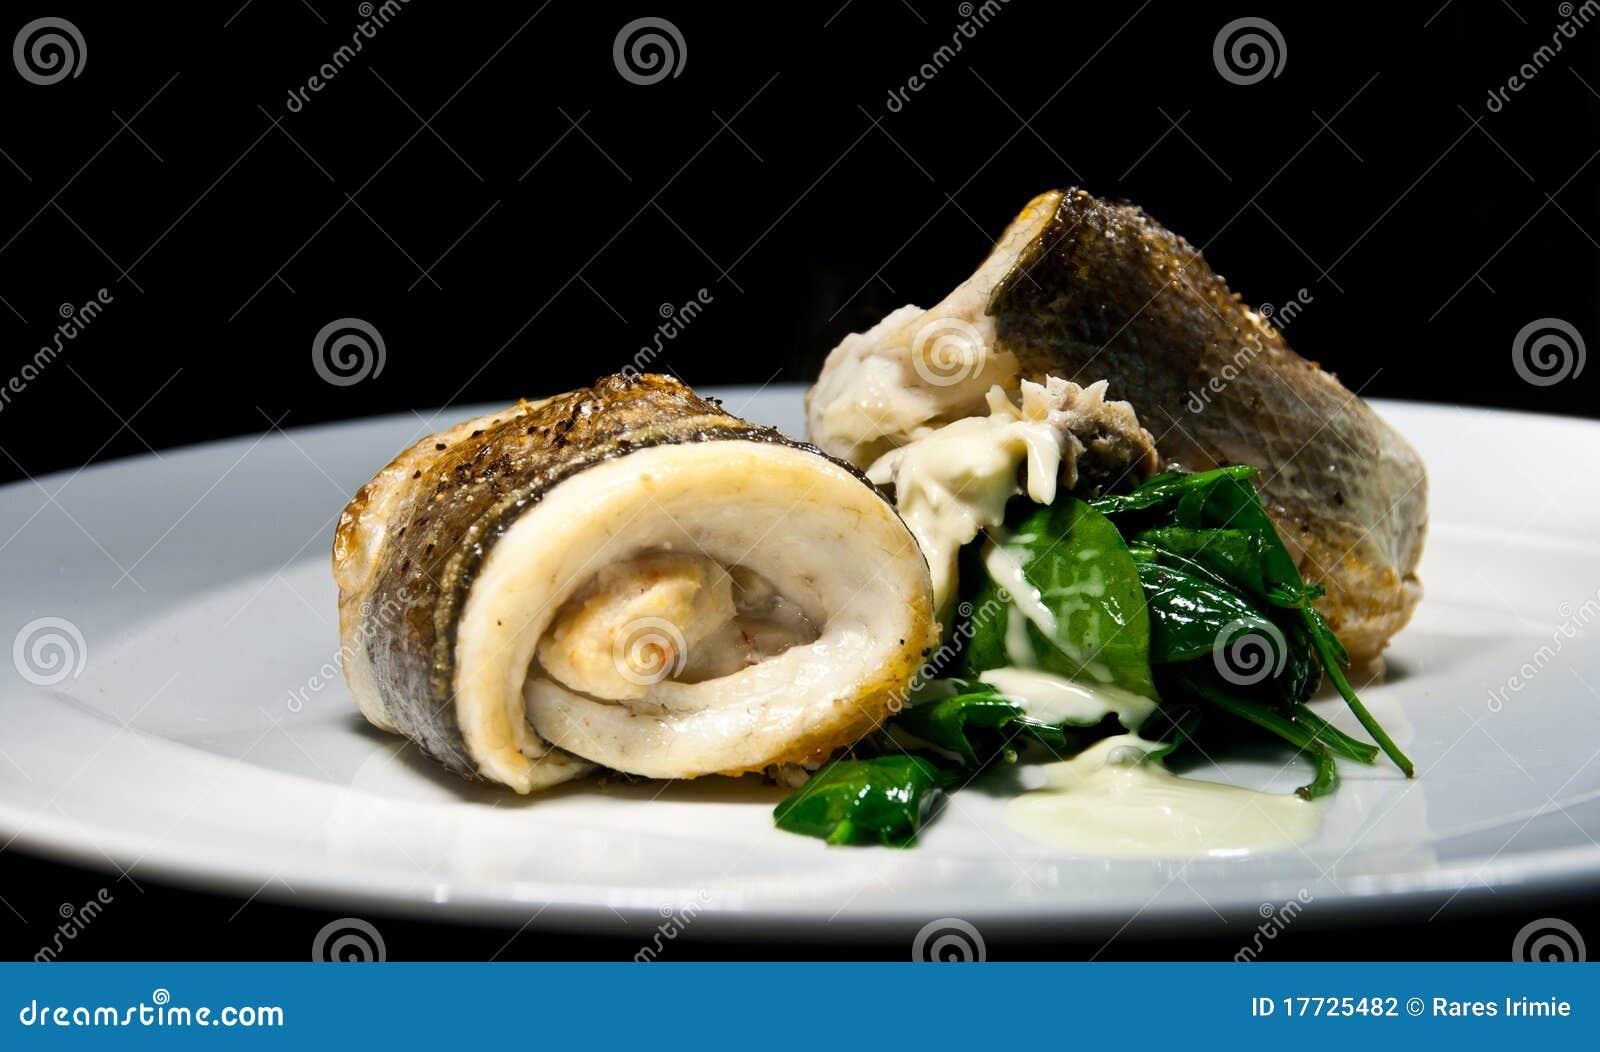 Fish food 1 stock photography image 17725482 for Fish food golf balls